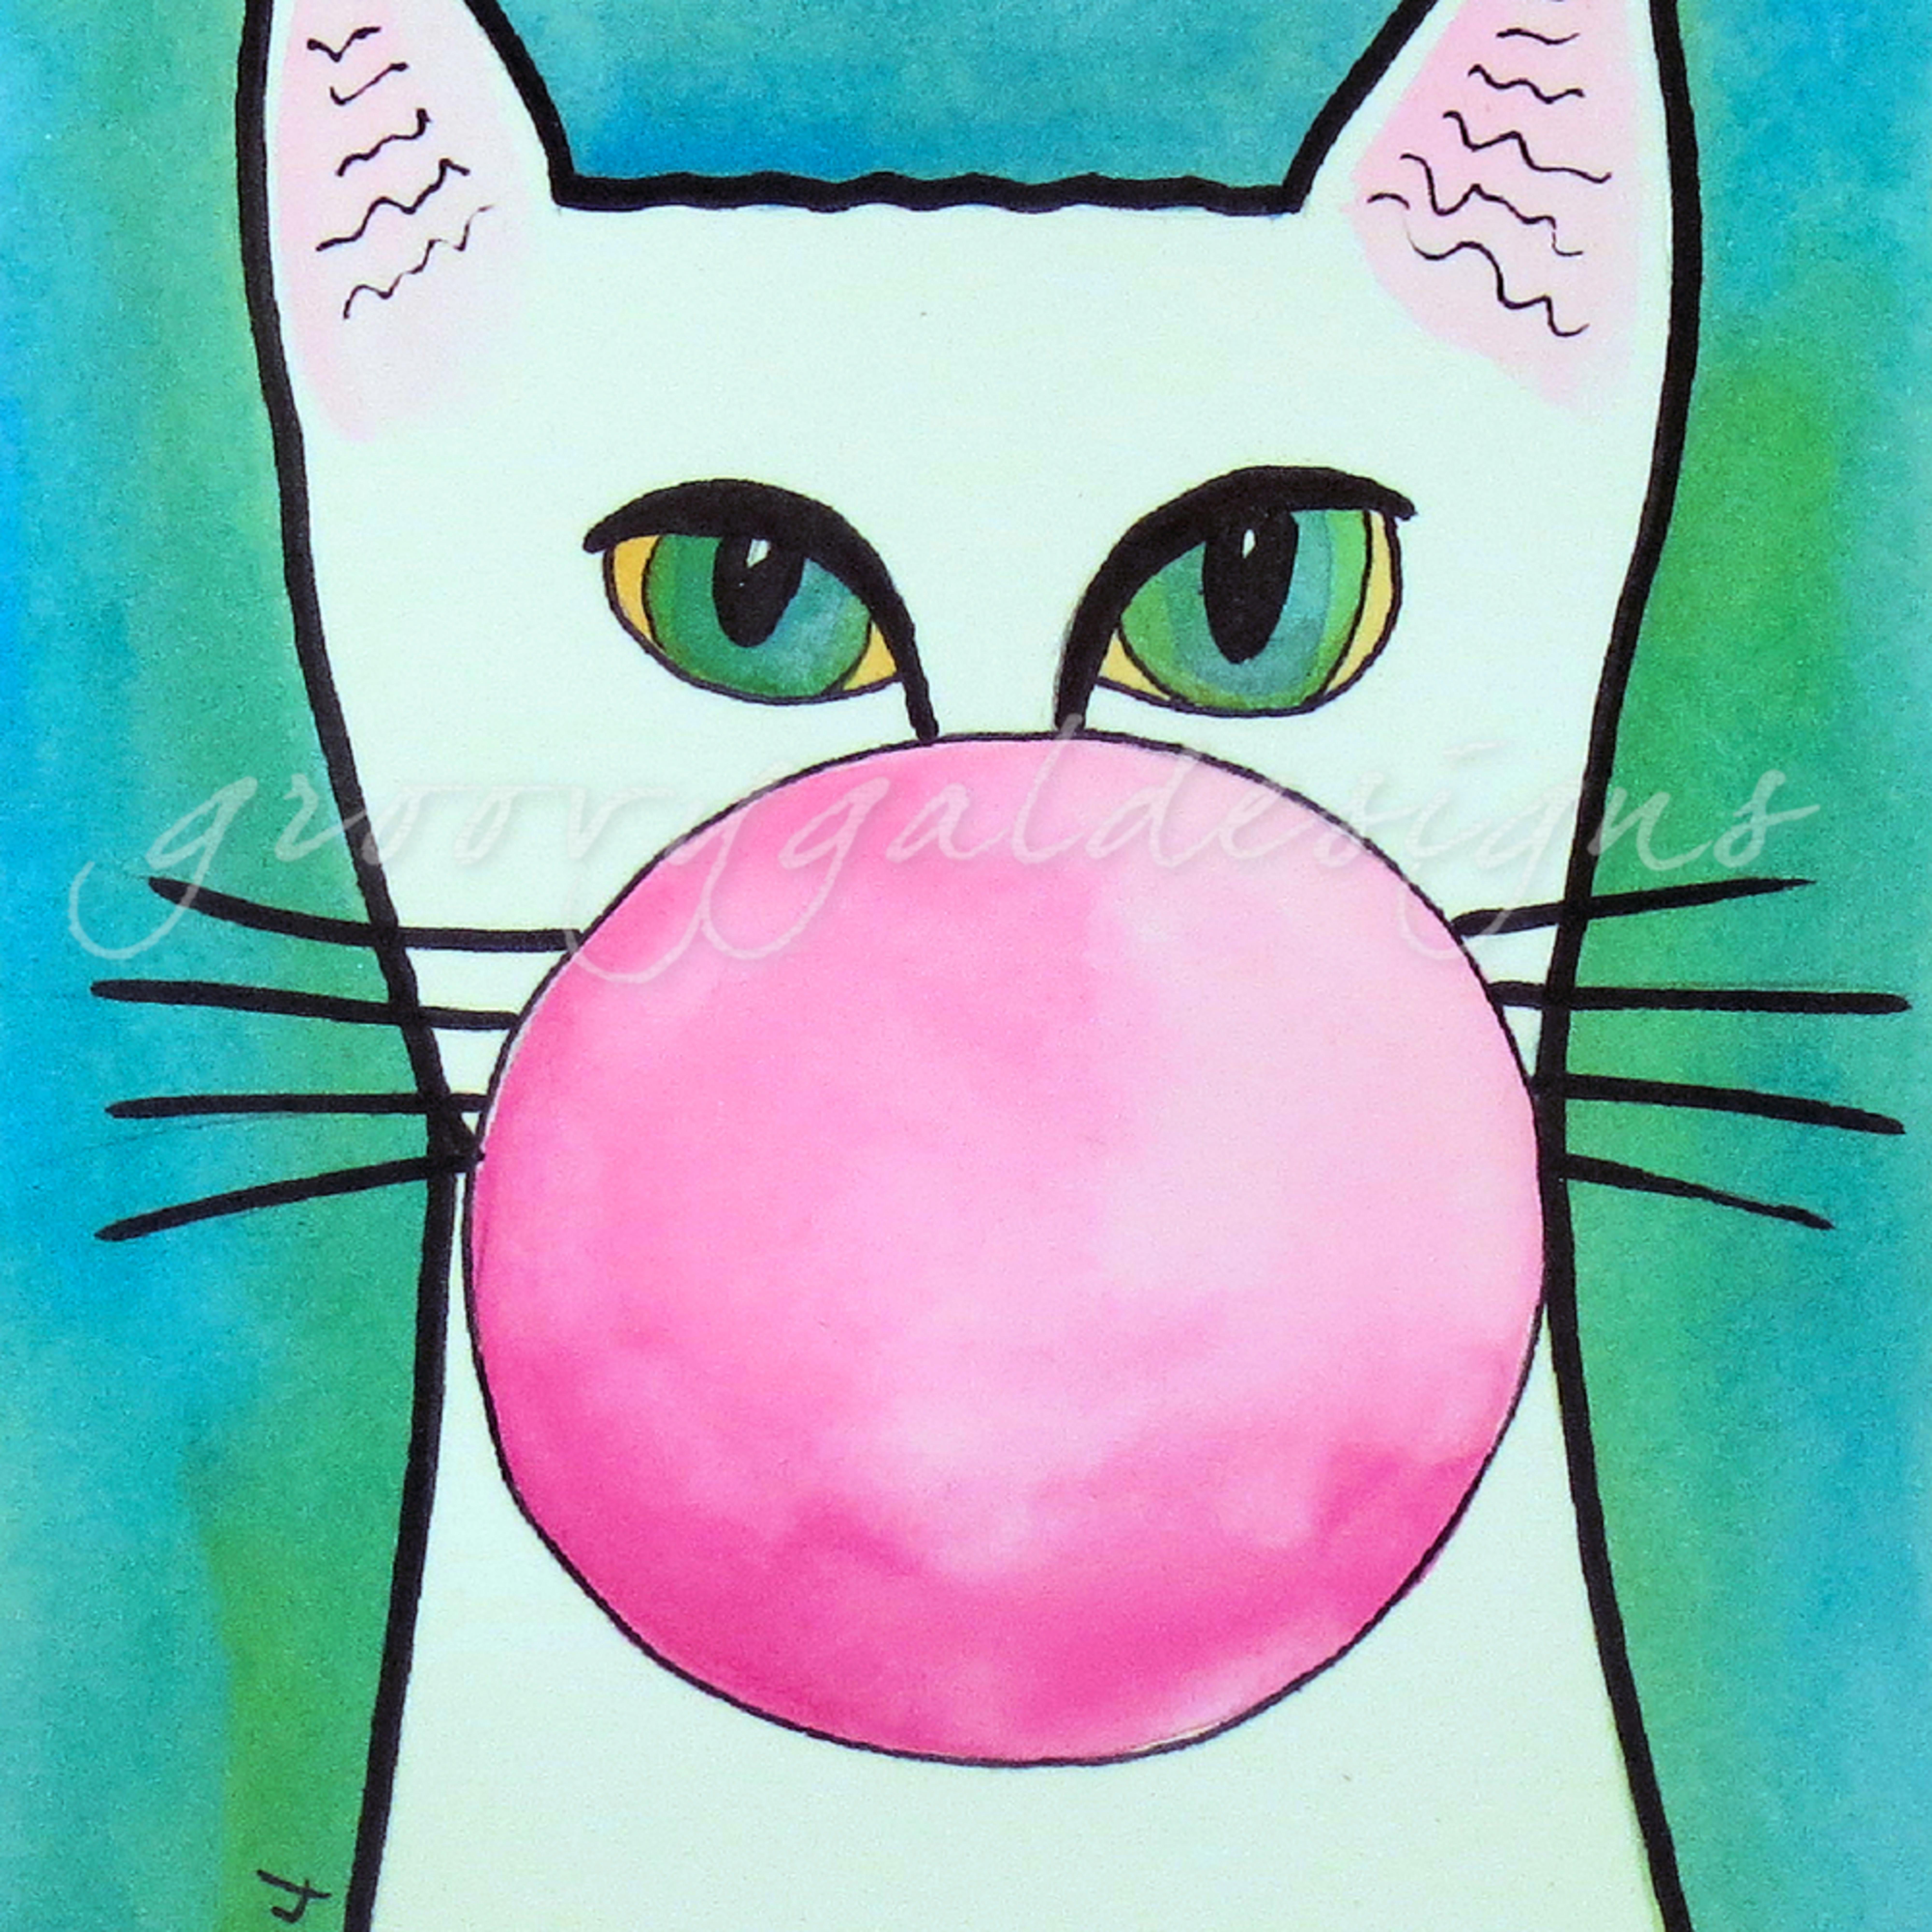 Bubble gum cat on blue wrjjy9